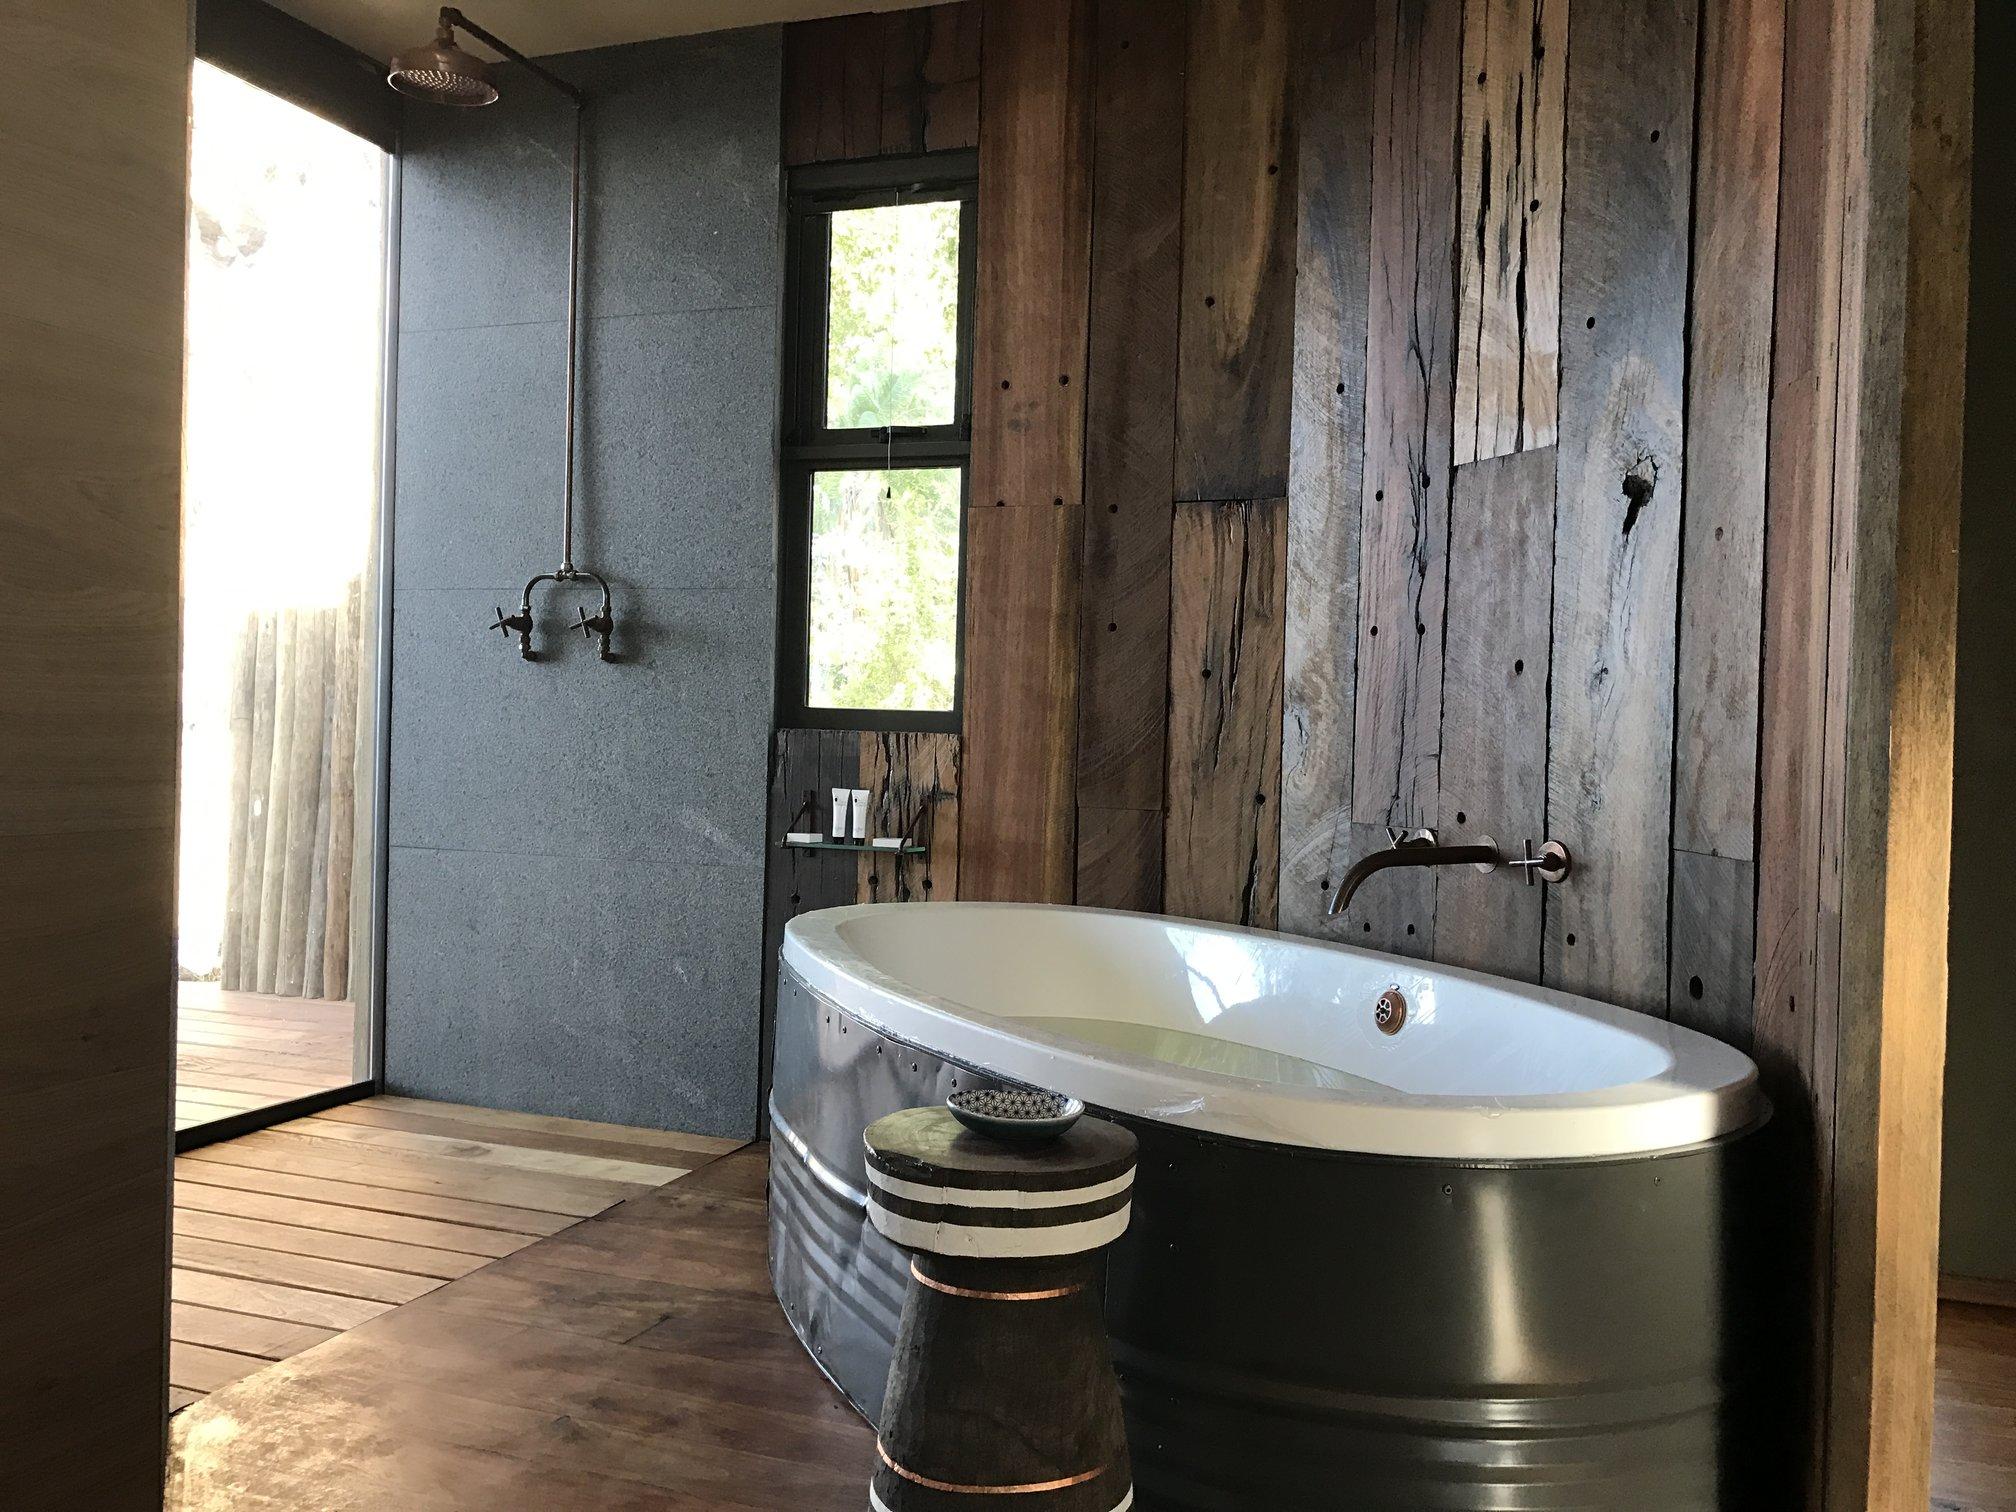 Bathroom pod interior